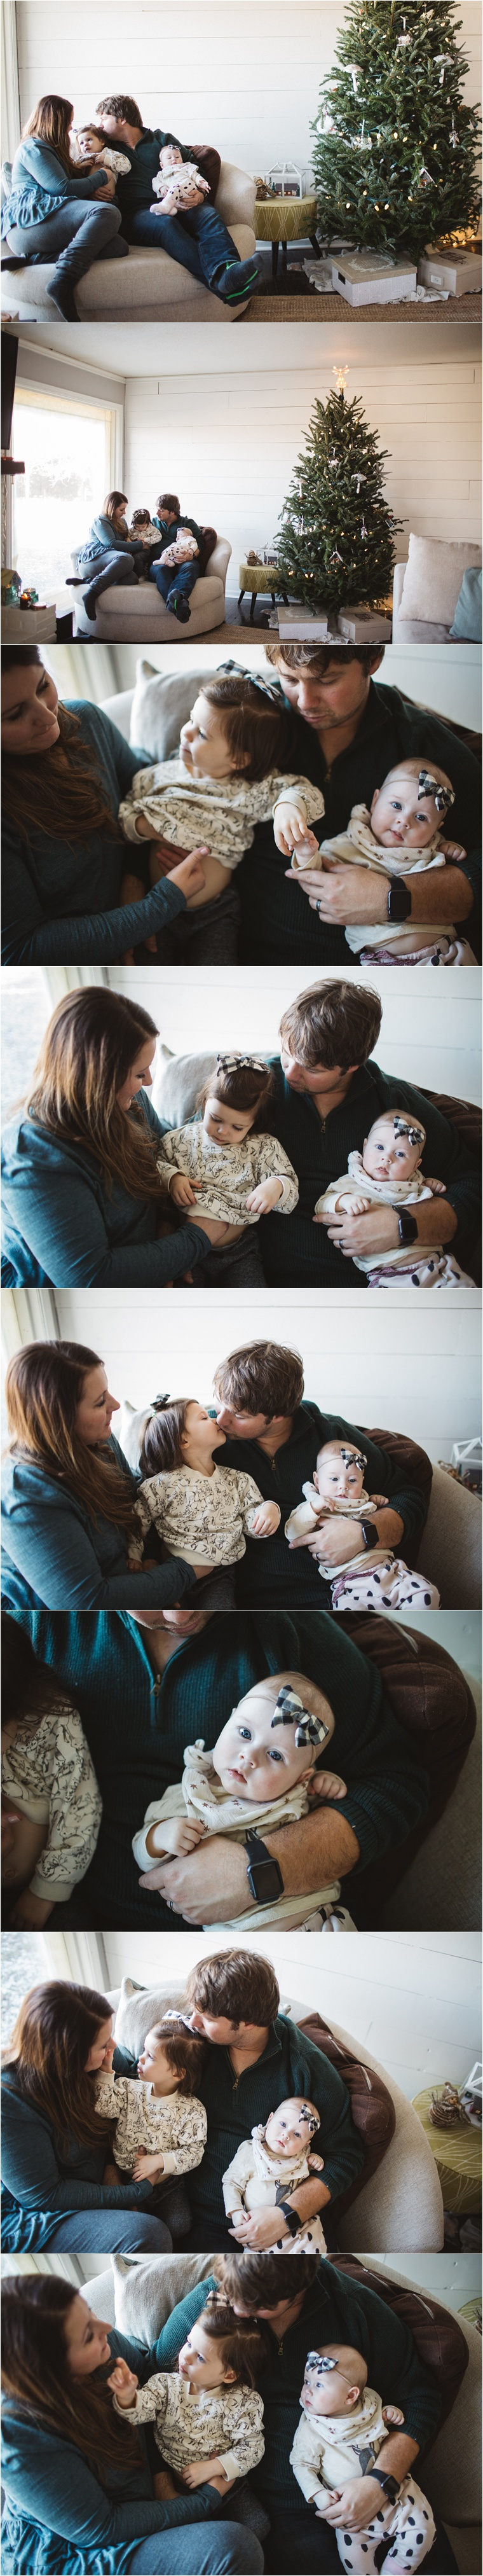 kansascityfamilyphotographer_0224